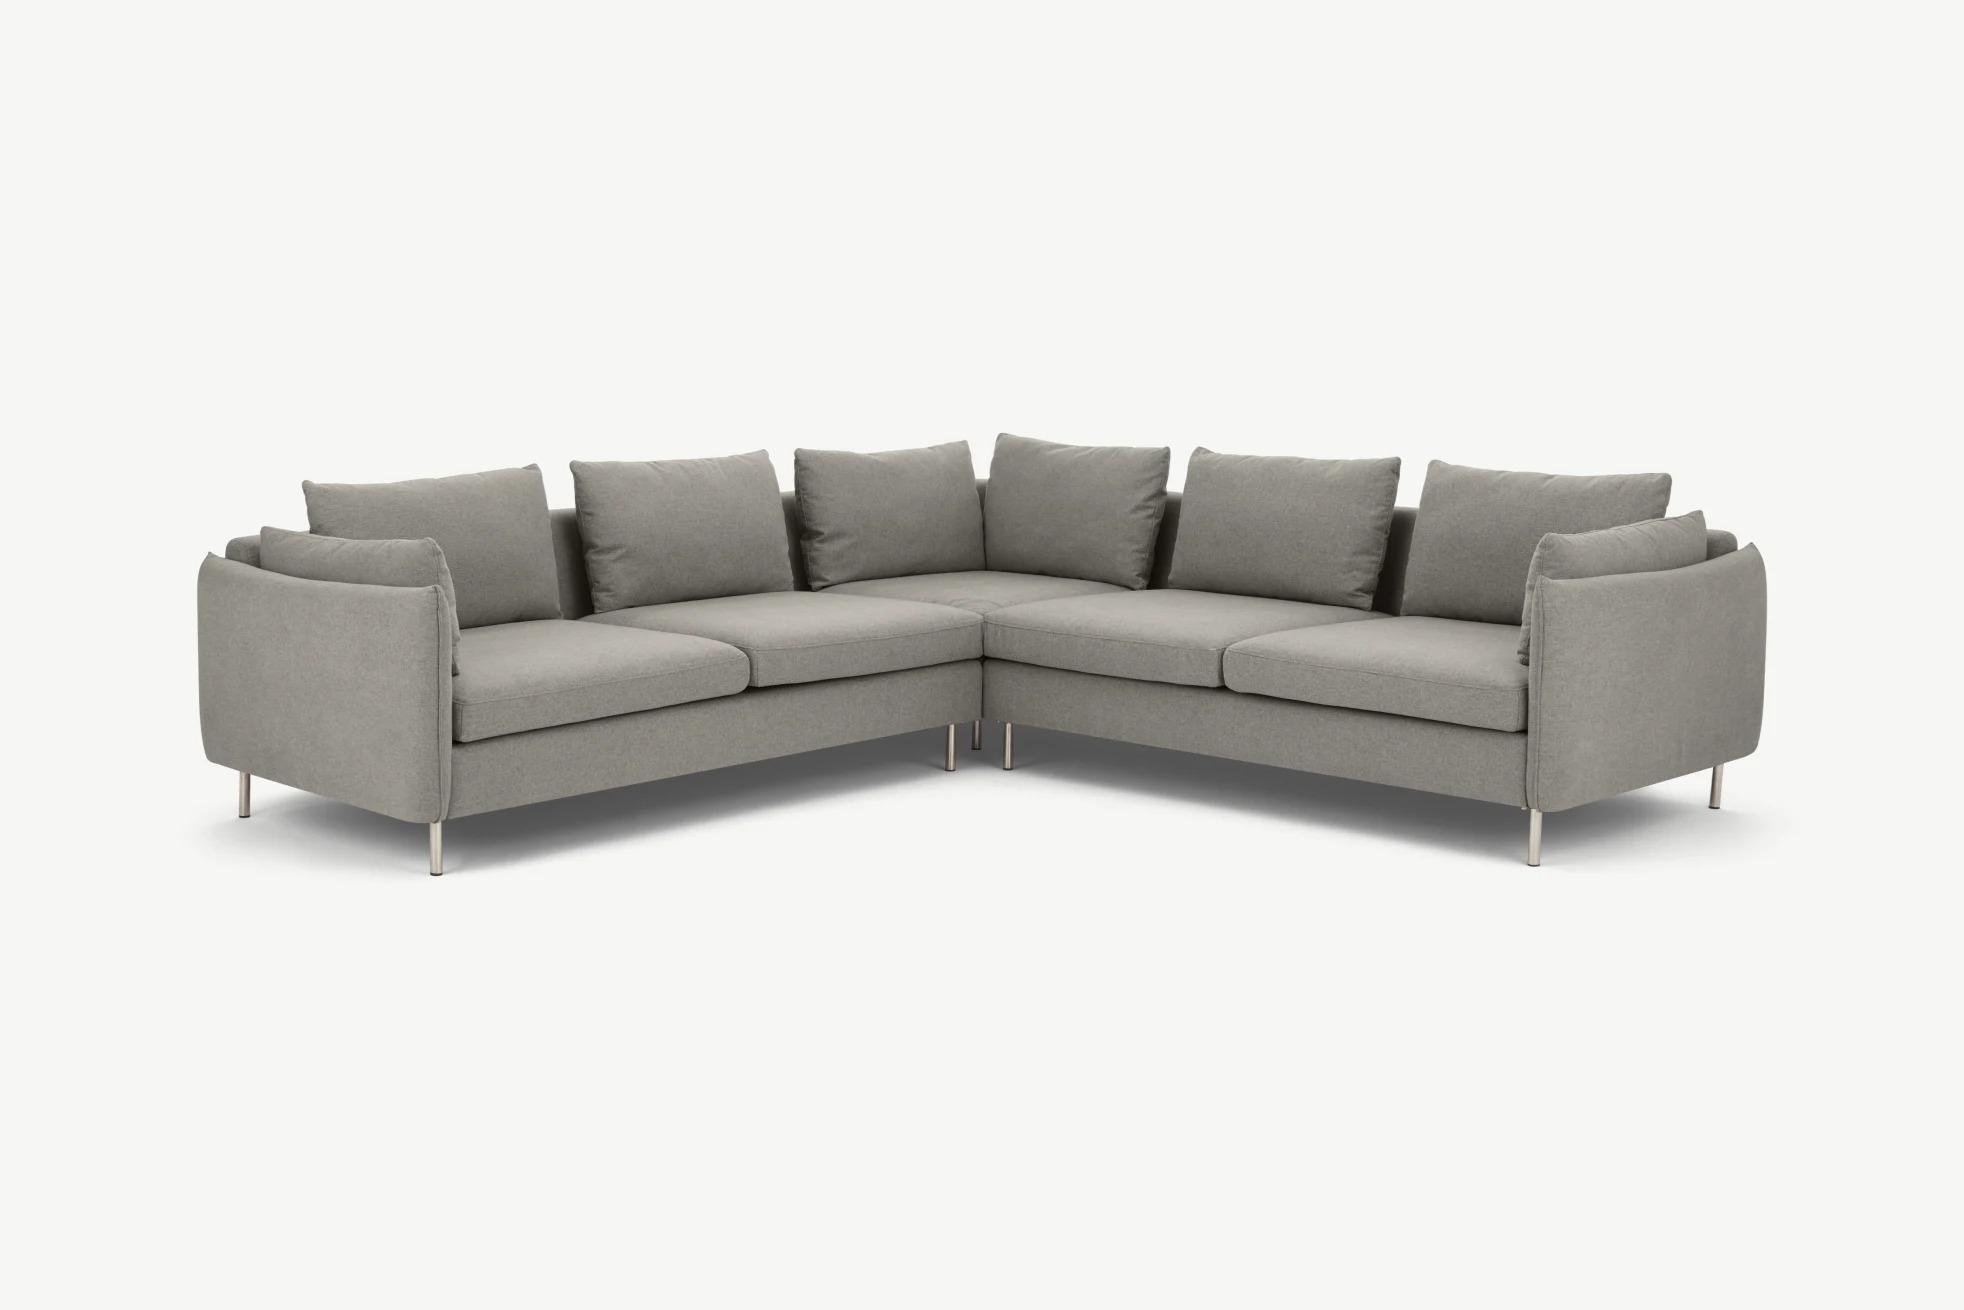 Vento 5 Seater Corner Sofa, Manhattan Gray